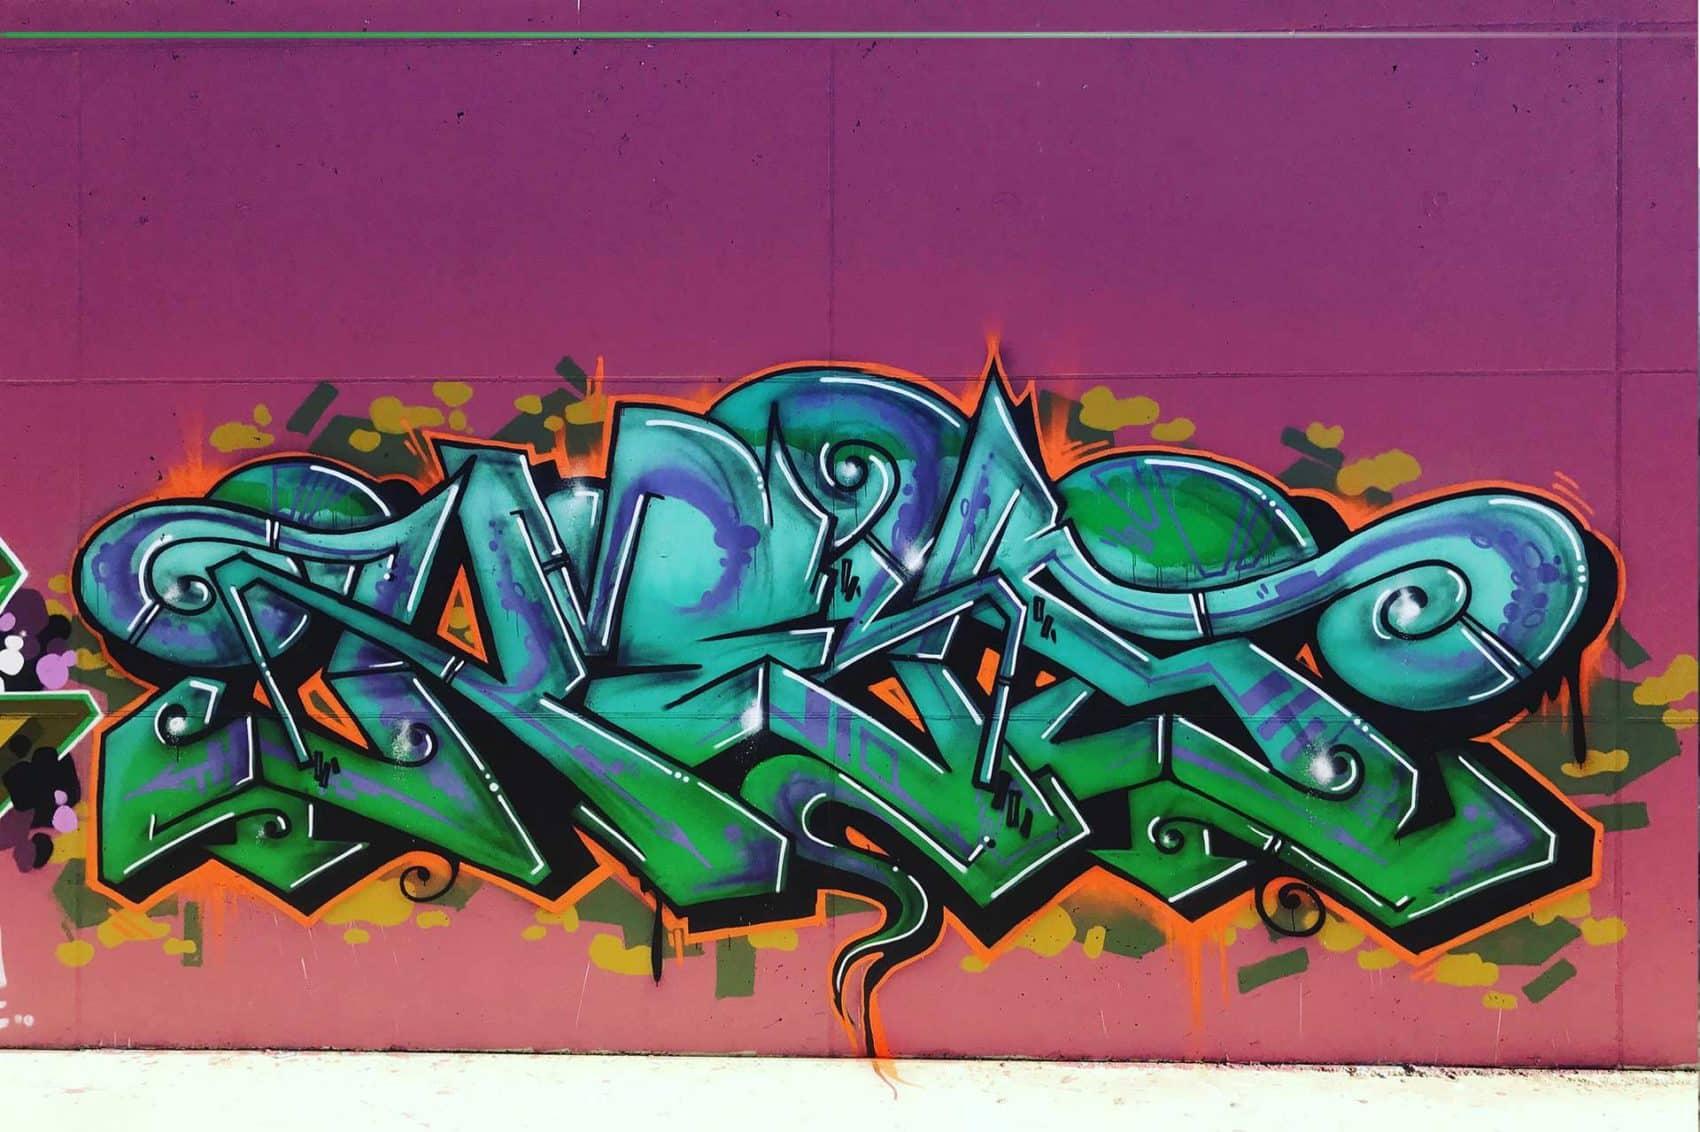 Graffiti writer keys